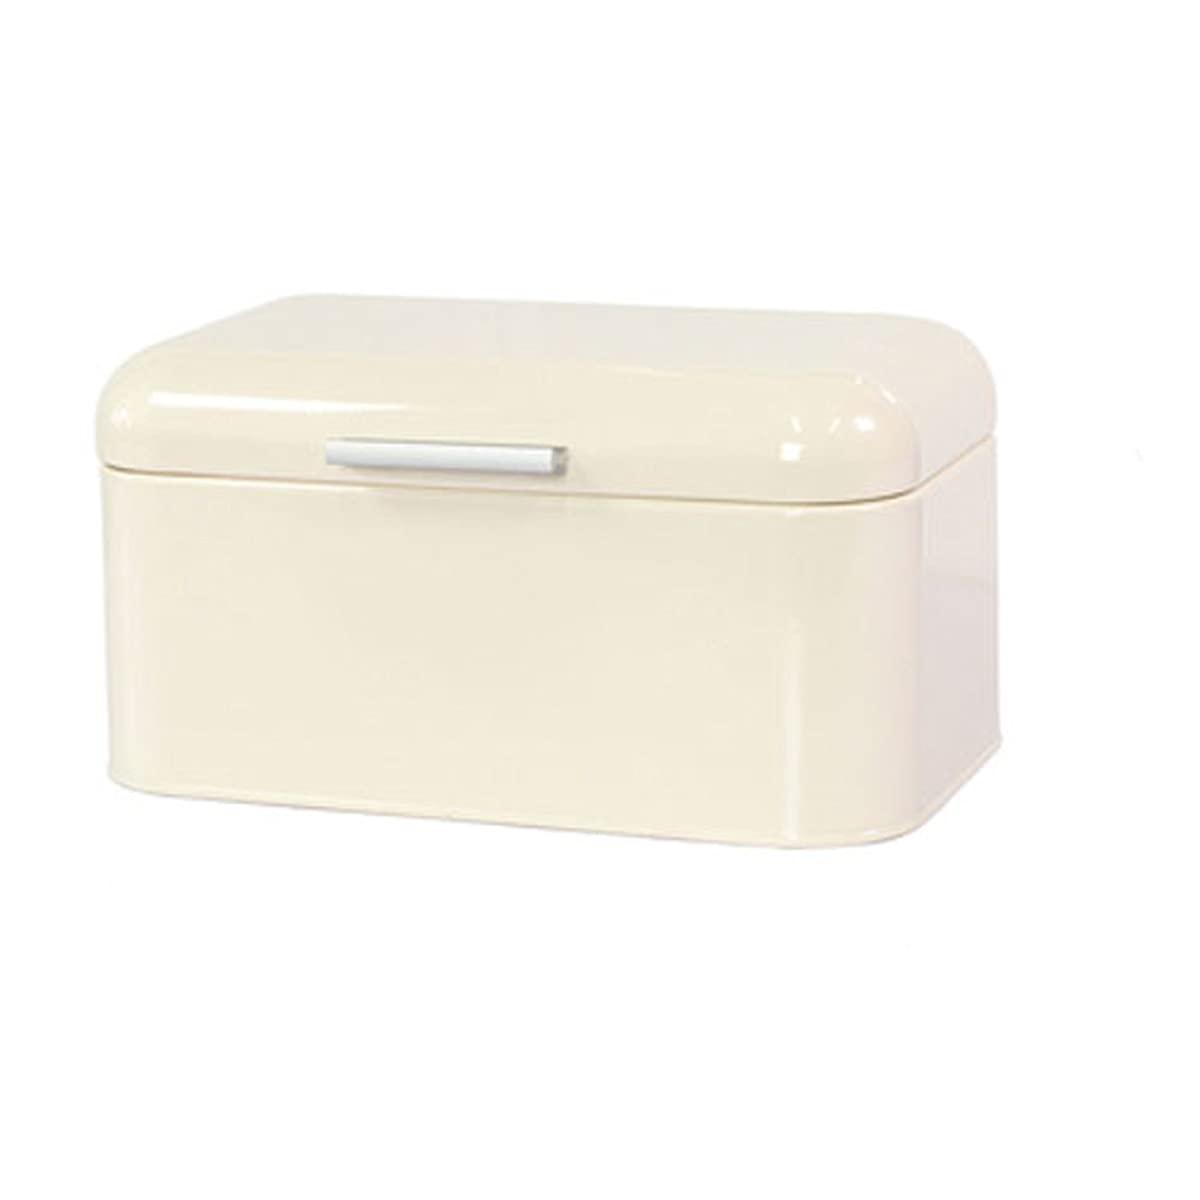 MingChengKj Old- 4 years warranty Fashioned Bread Box- Box Iron Art Desktop 35% OFF Snack